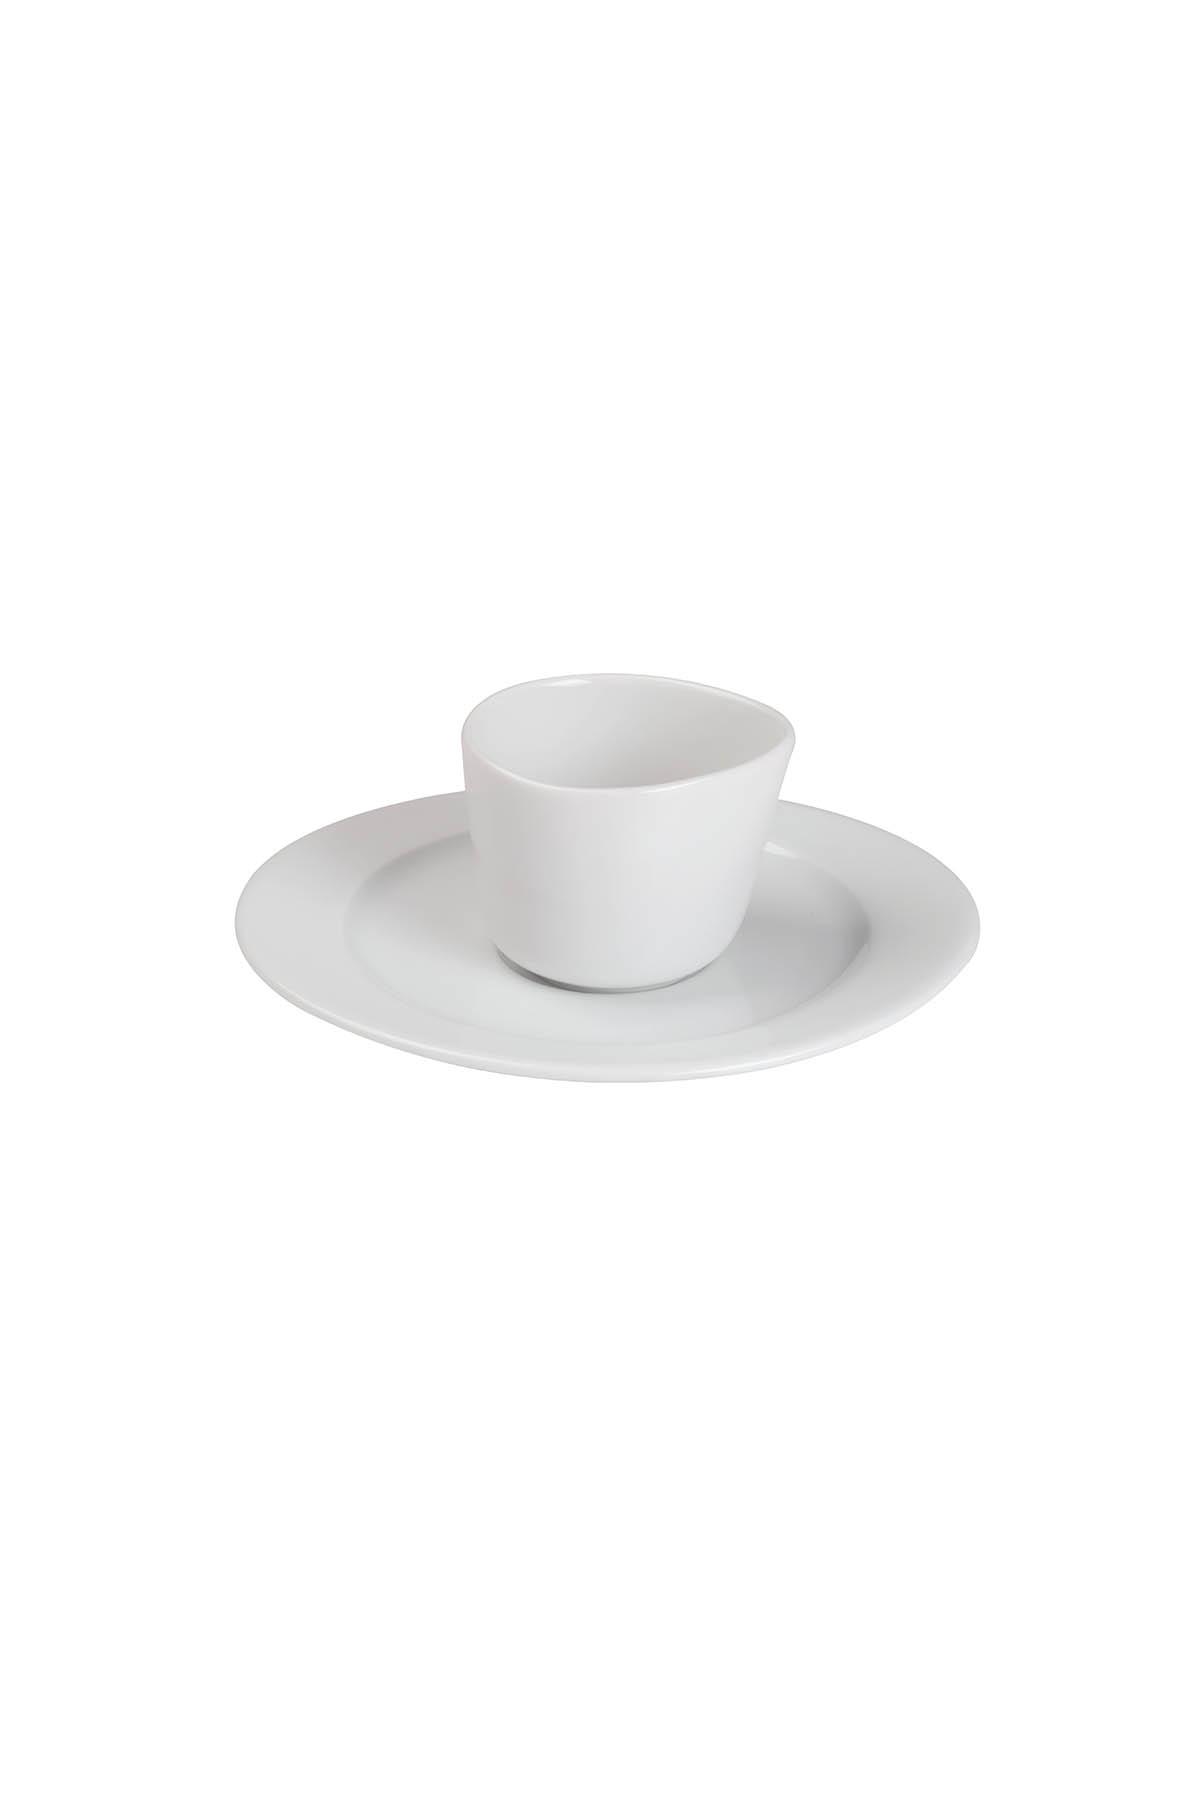 Kütahya Porselen - Kütahya Porselen Drop Sos Seti